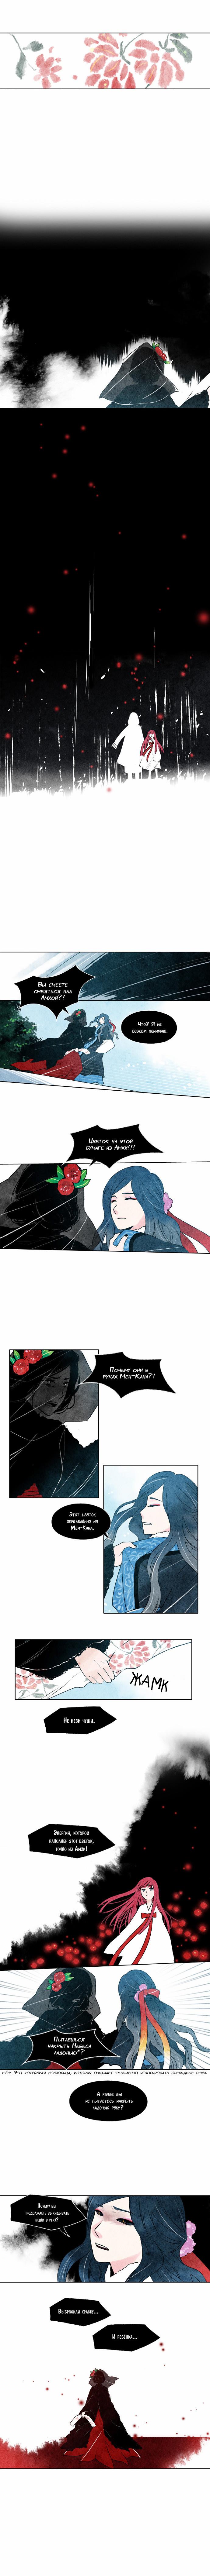 https://r1.ninemanga.com/comics/pic2/39/22503/416377/1532884293363.jpg Page 2